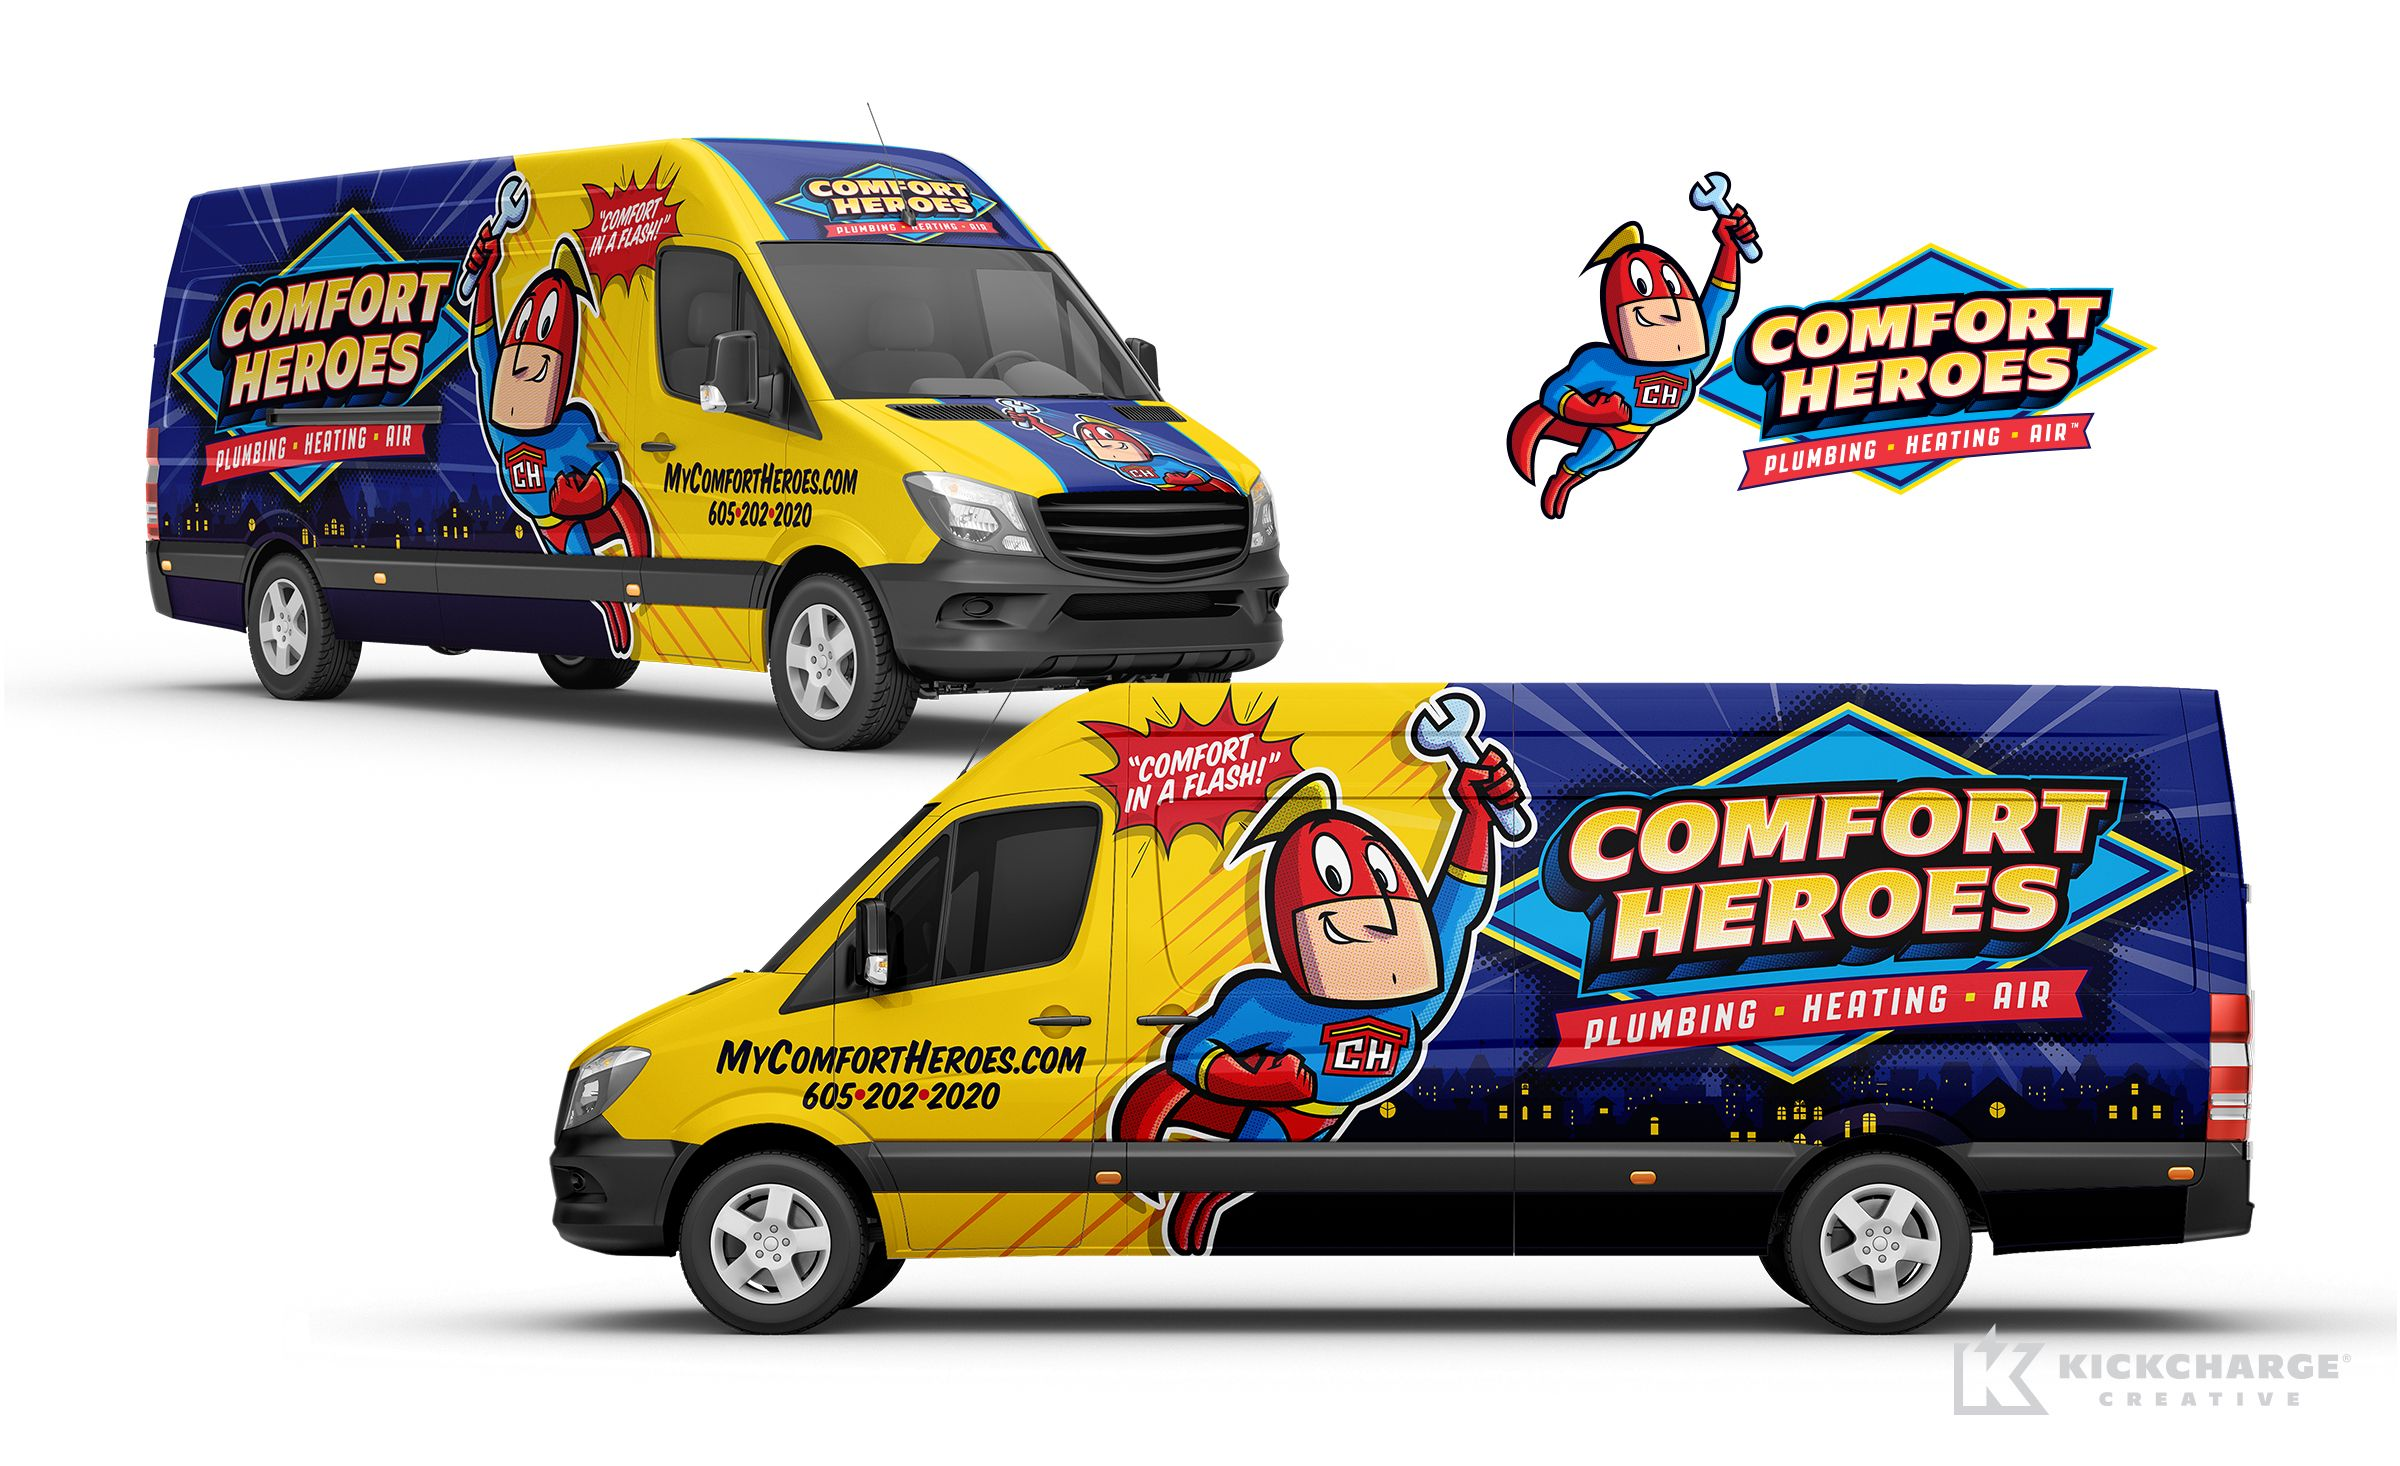 Comfort Heroes Kickcharge Creative In 2020 Car Wrap Design